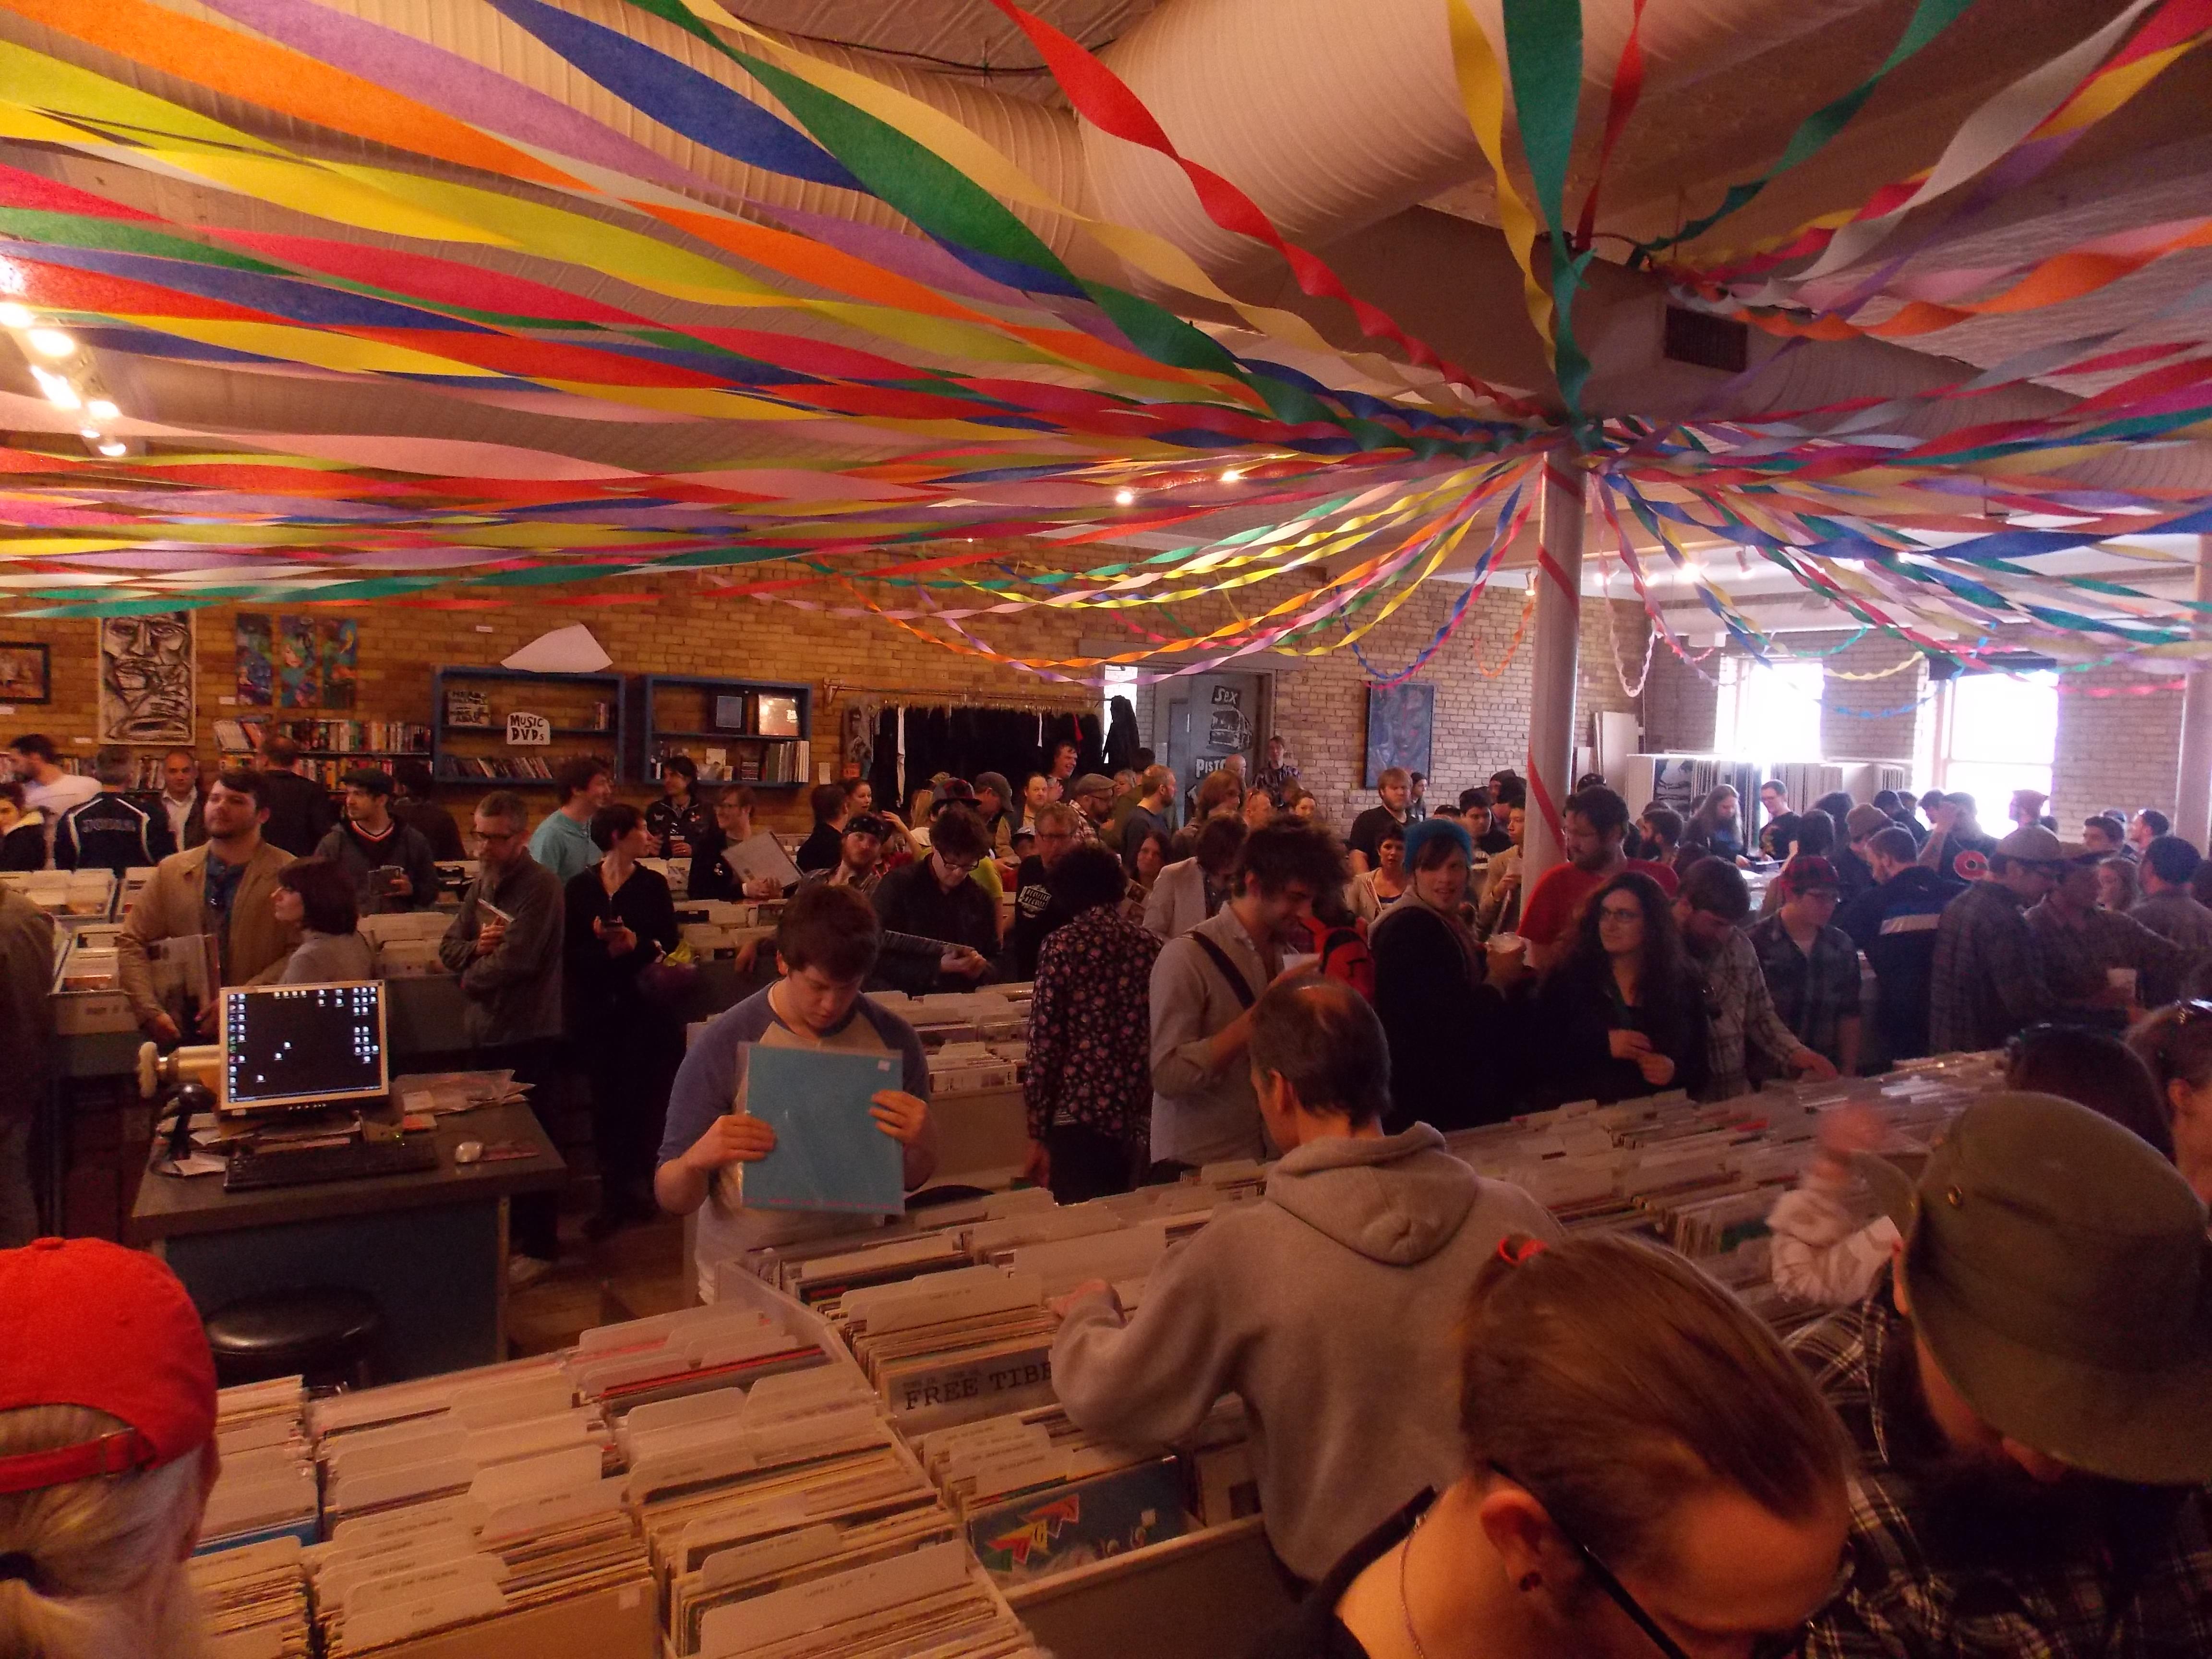 griz joe bonamassa dj grandmaster flash the big list spinning into record store day vertigo music and other independent shops will celebrate on saturday